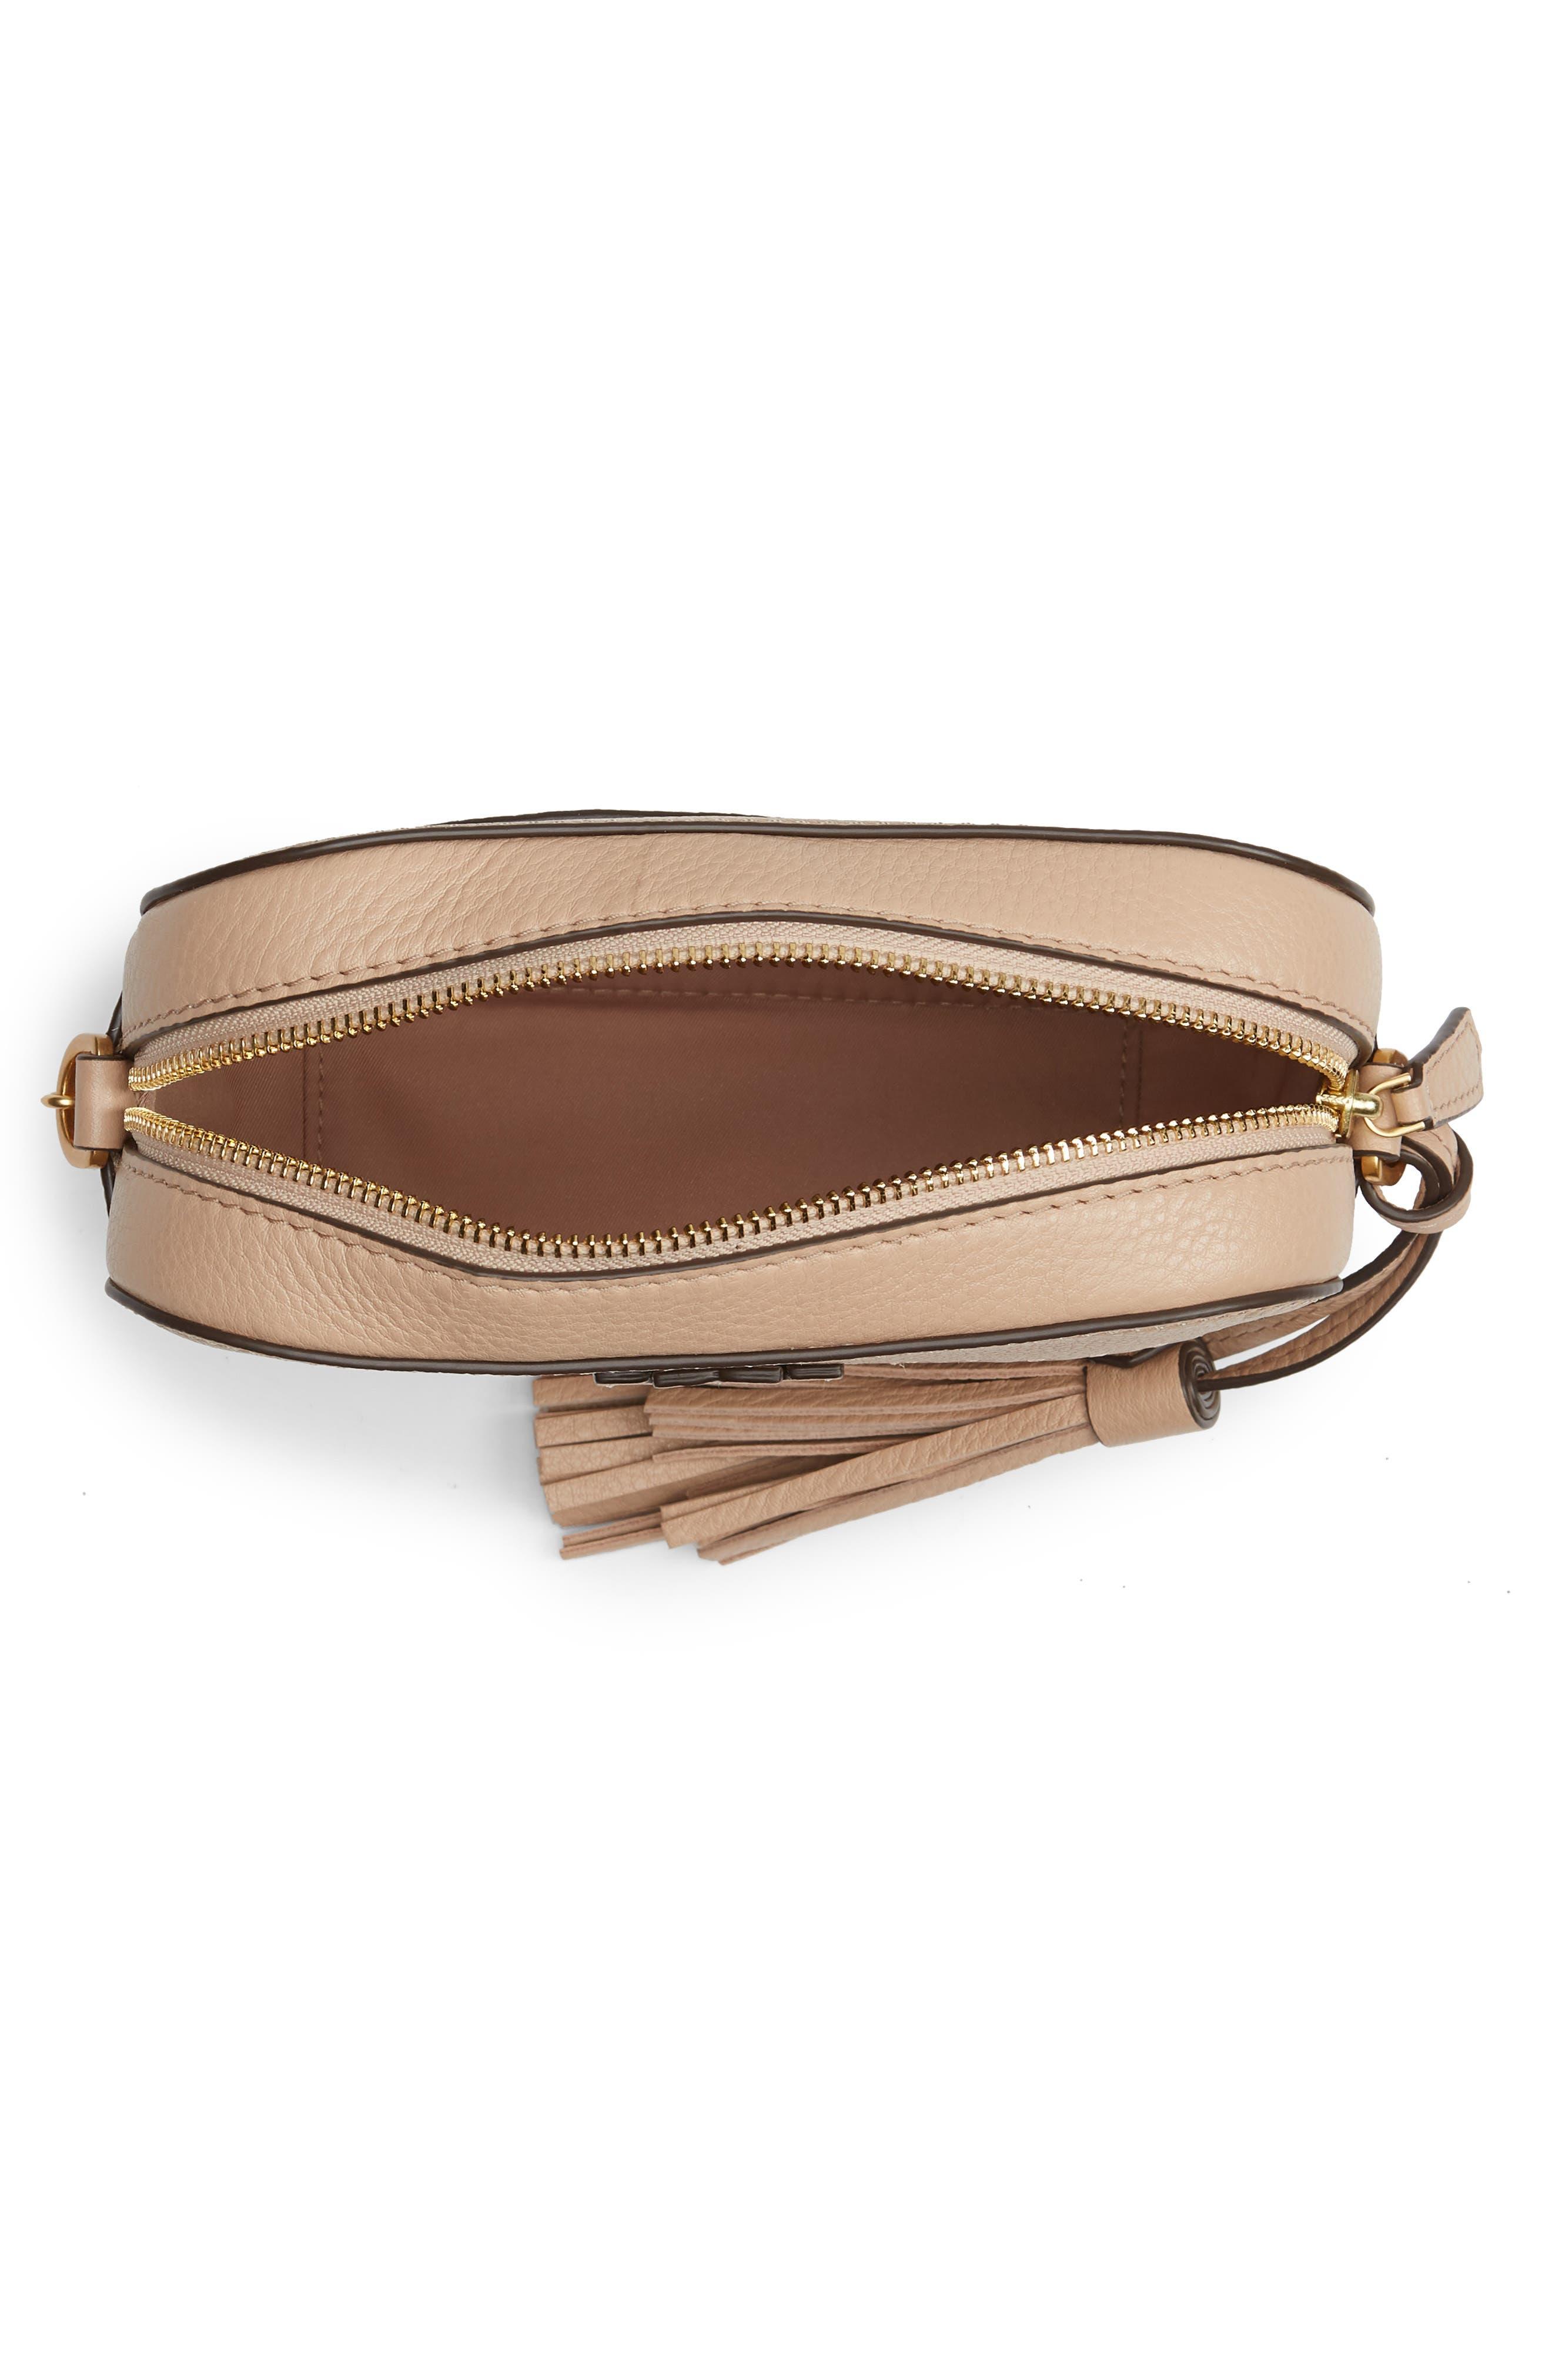 McGraw Leather Camera Bag,                             Alternate thumbnail 4, color,                             DEVON SAND